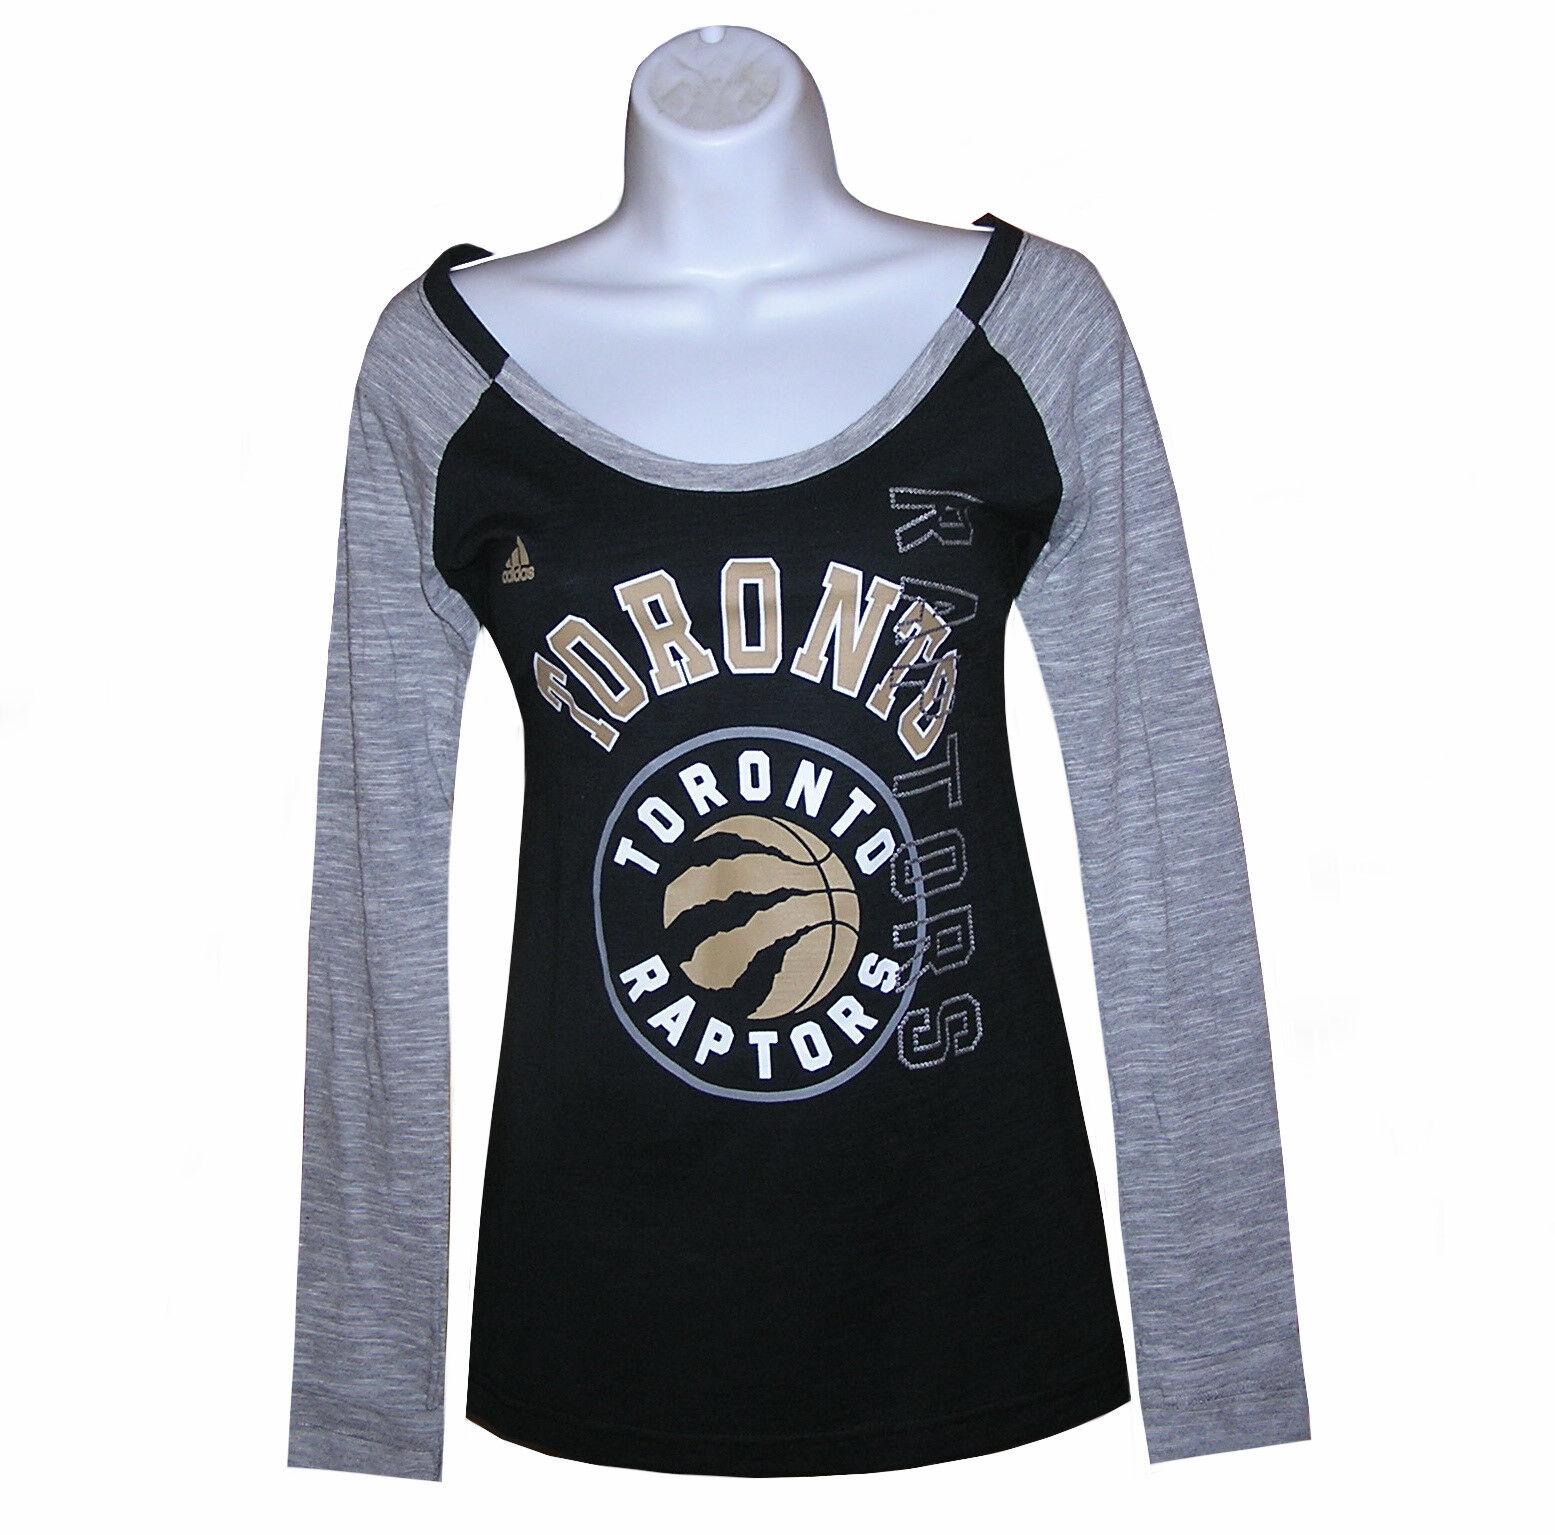 Nba Womens Apparel - Toronto Raptors Ladies ADIDAS Nba LS Te